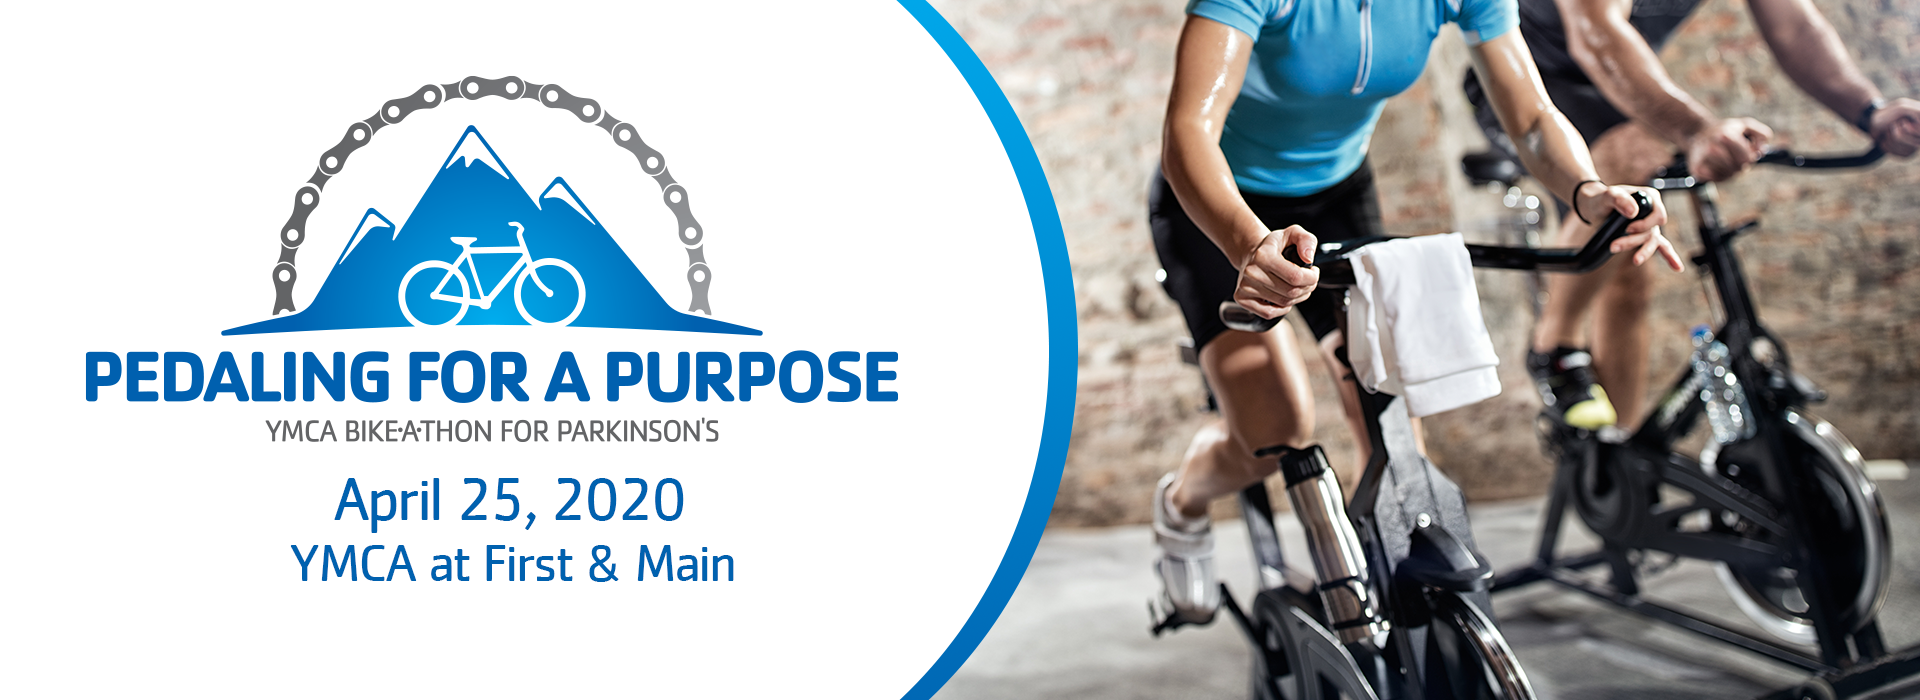 2020_YMCA_PedalingForAPurpose_1920x700